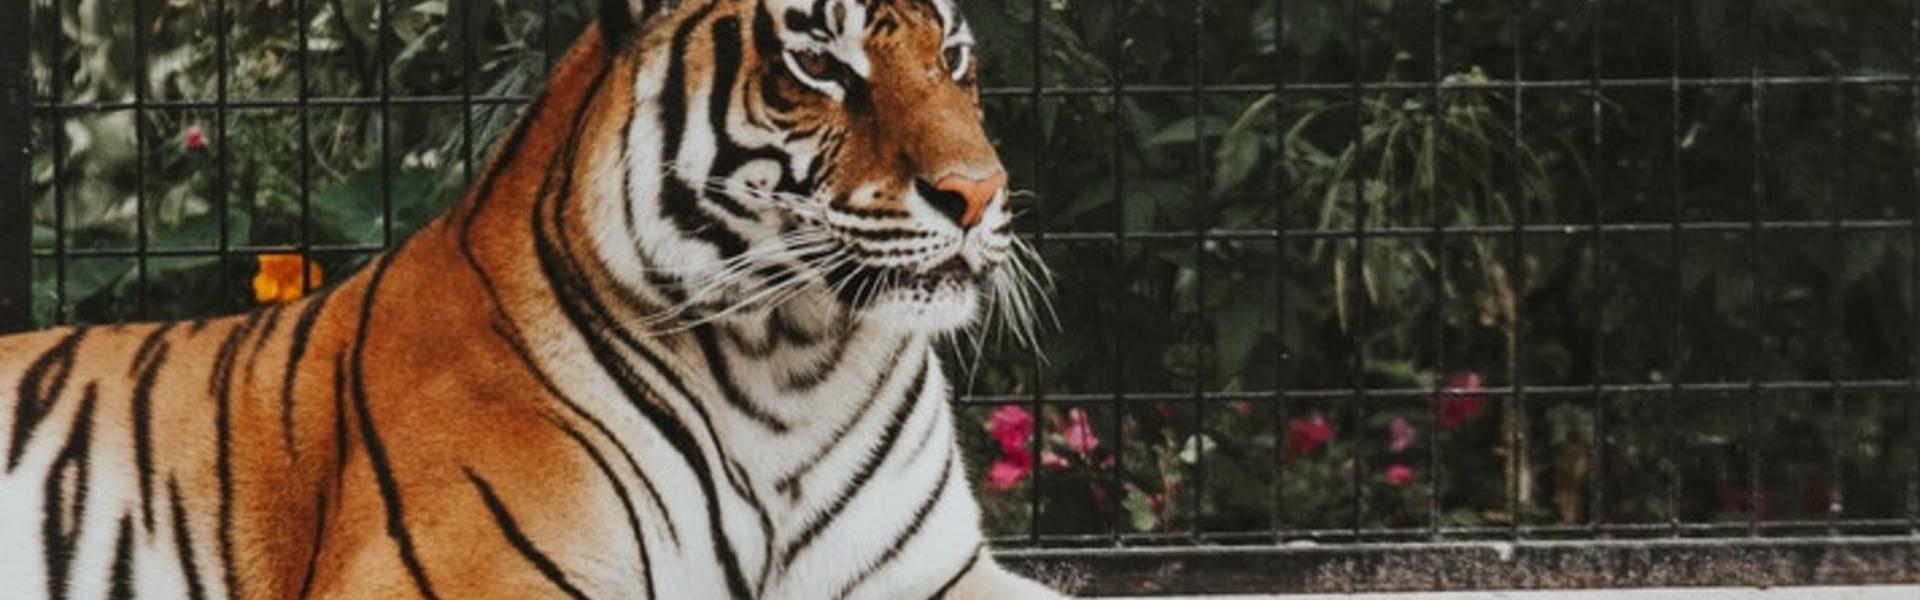 Zoo Occitanie